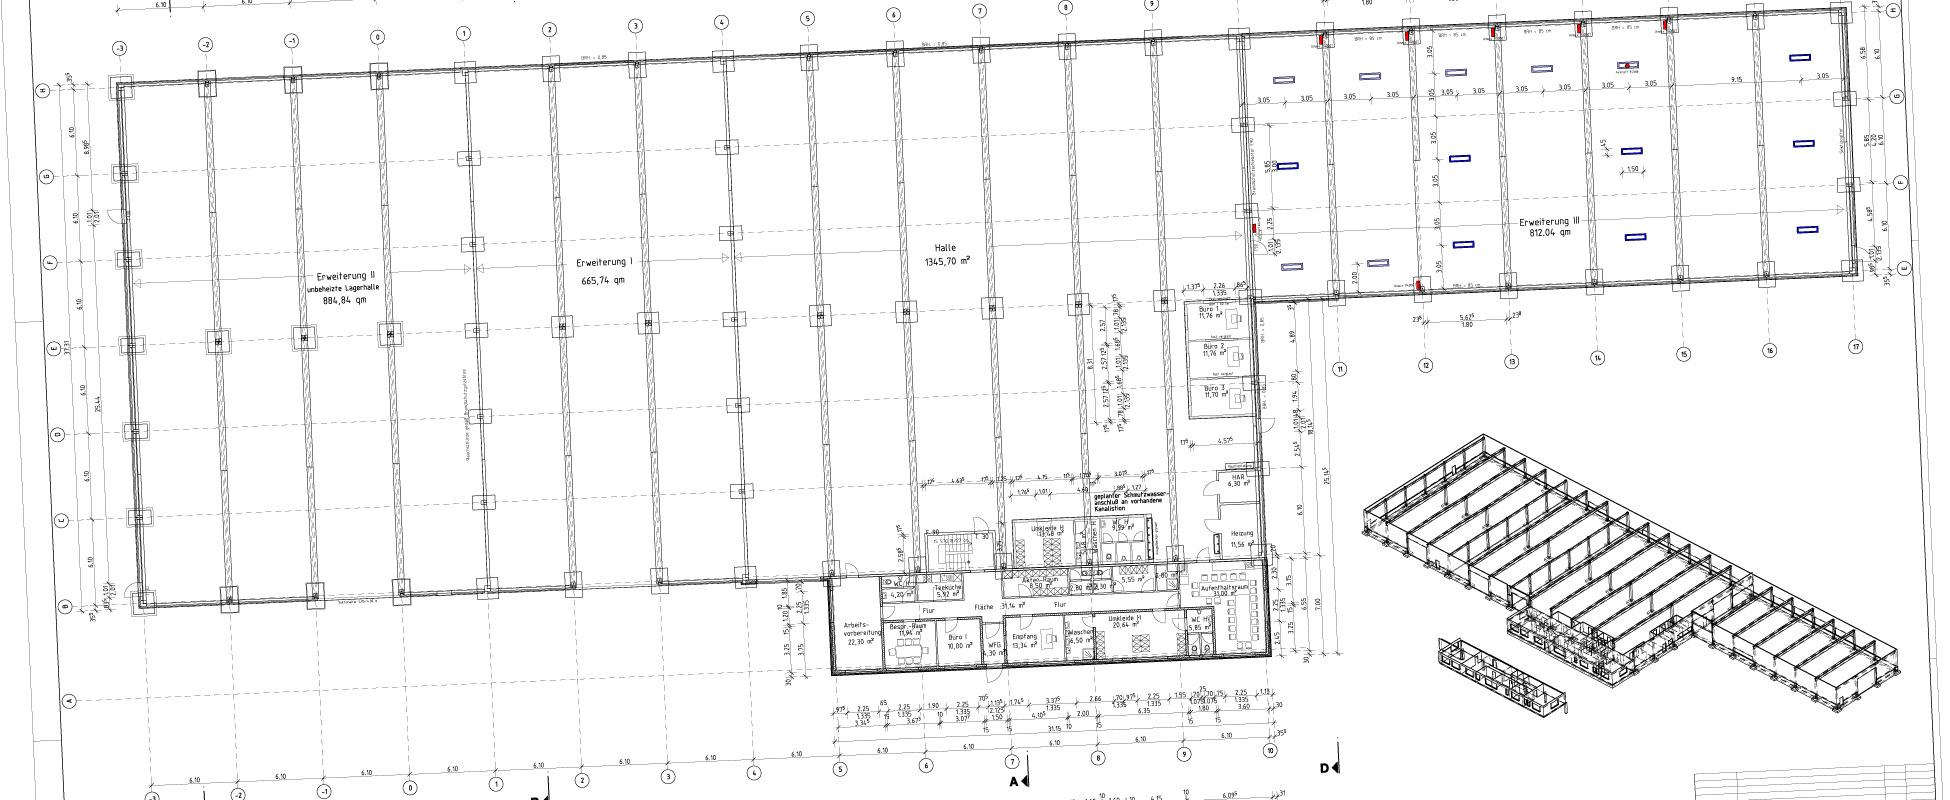 Grundriss Architektur grundriss architektur chlebusch chlebusch